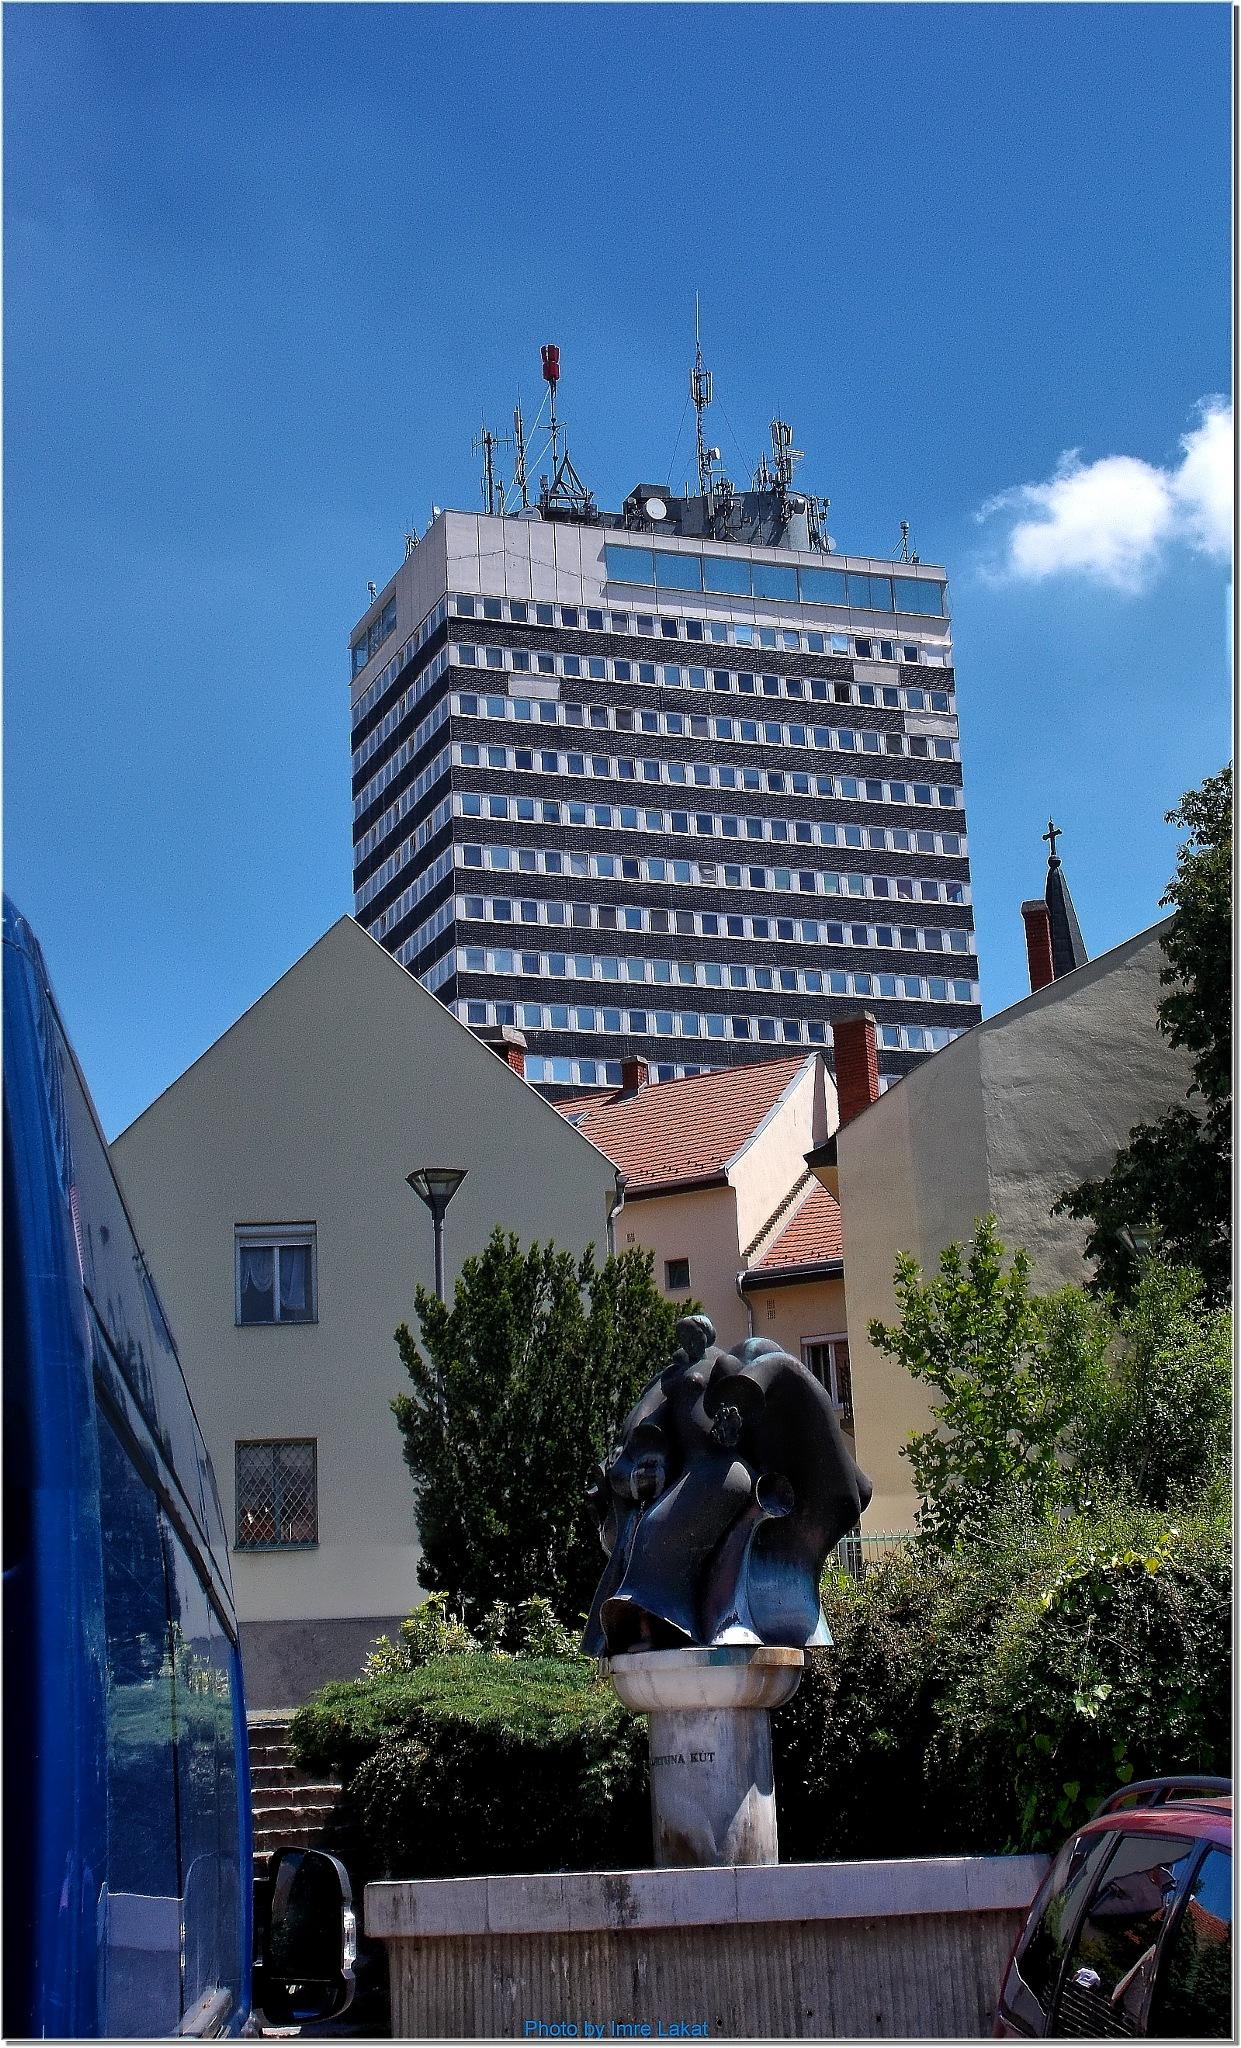 Fortuna monument in Veszprém by Imre Lakat